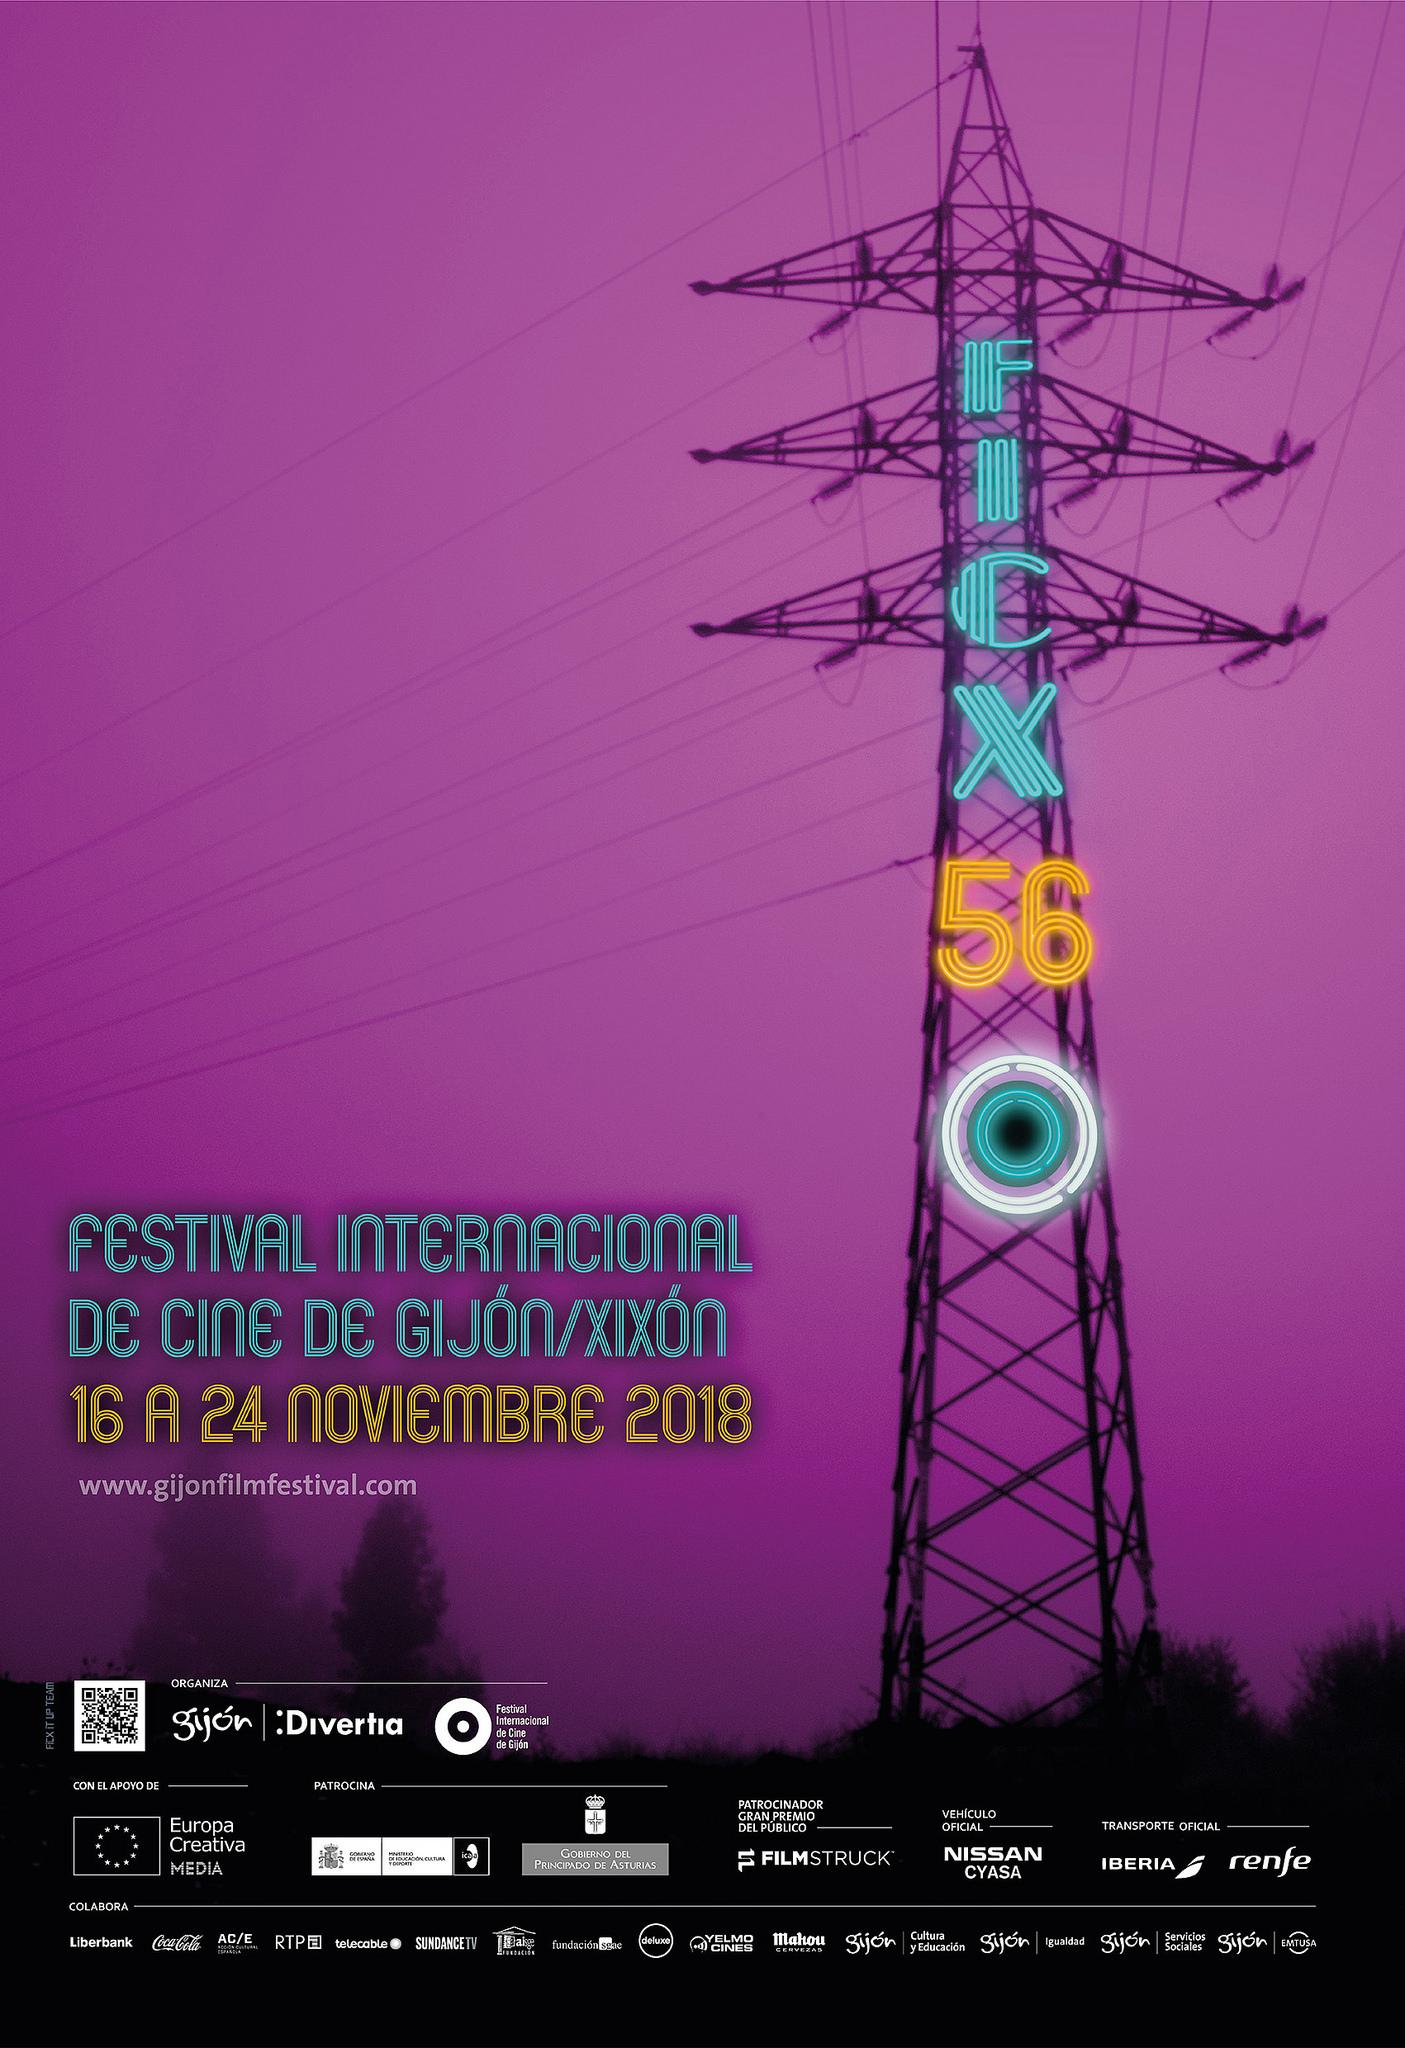 Festival internacional de cine de Jijón